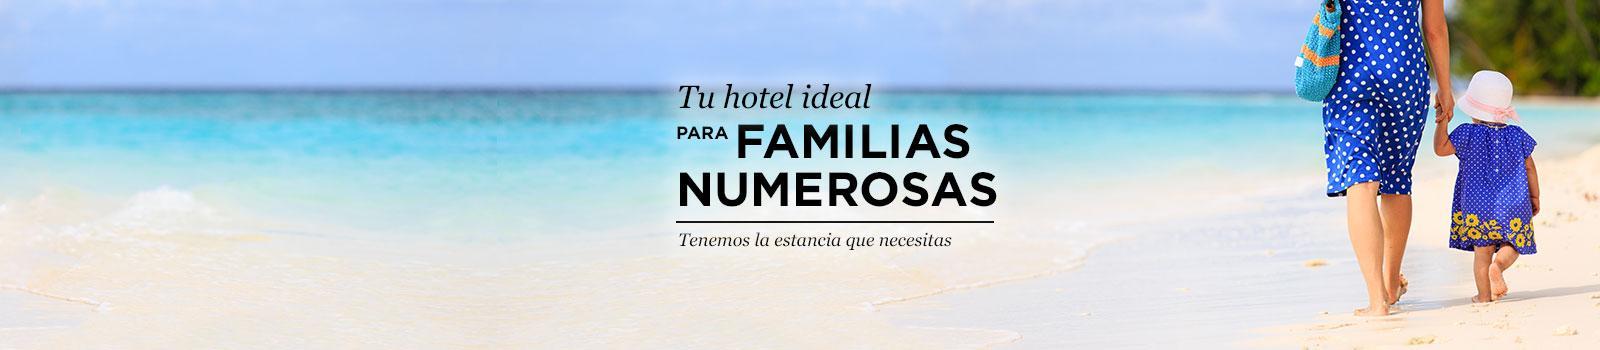 Hoteles familias numerosas ofertas viajes carrefour for Hoteles familias numerosas